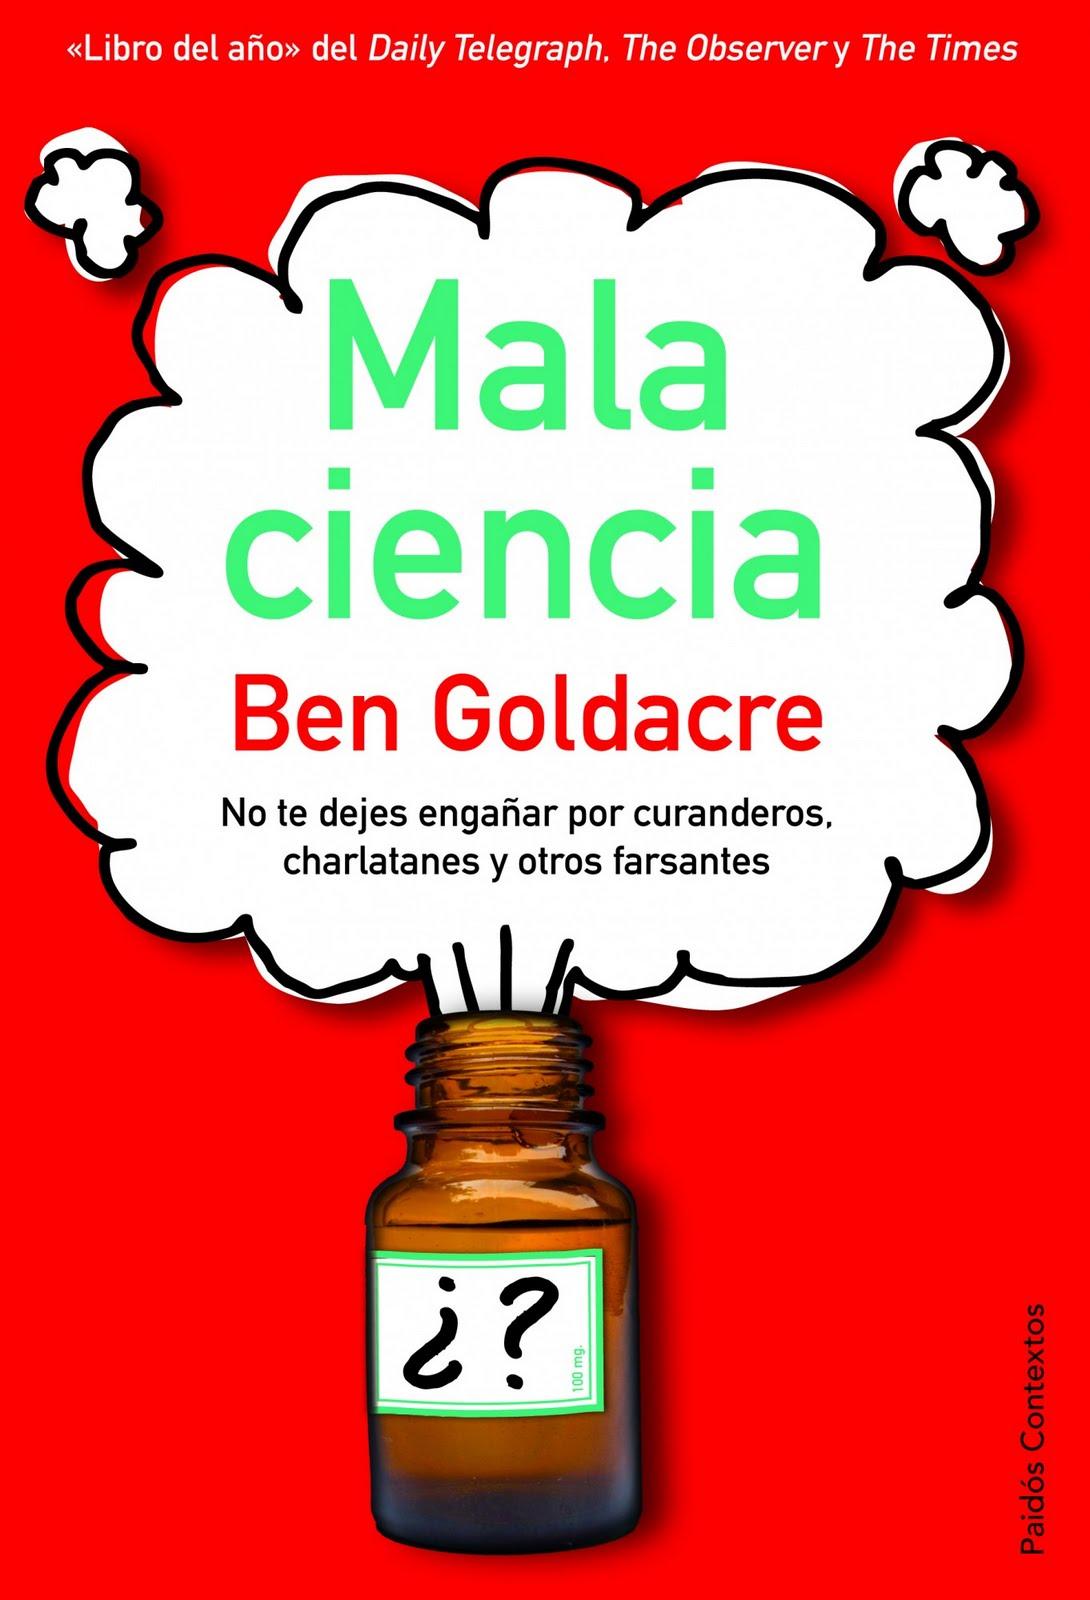 Mala Ciencia-Ben Goldacre[Divulgacion EPUB]